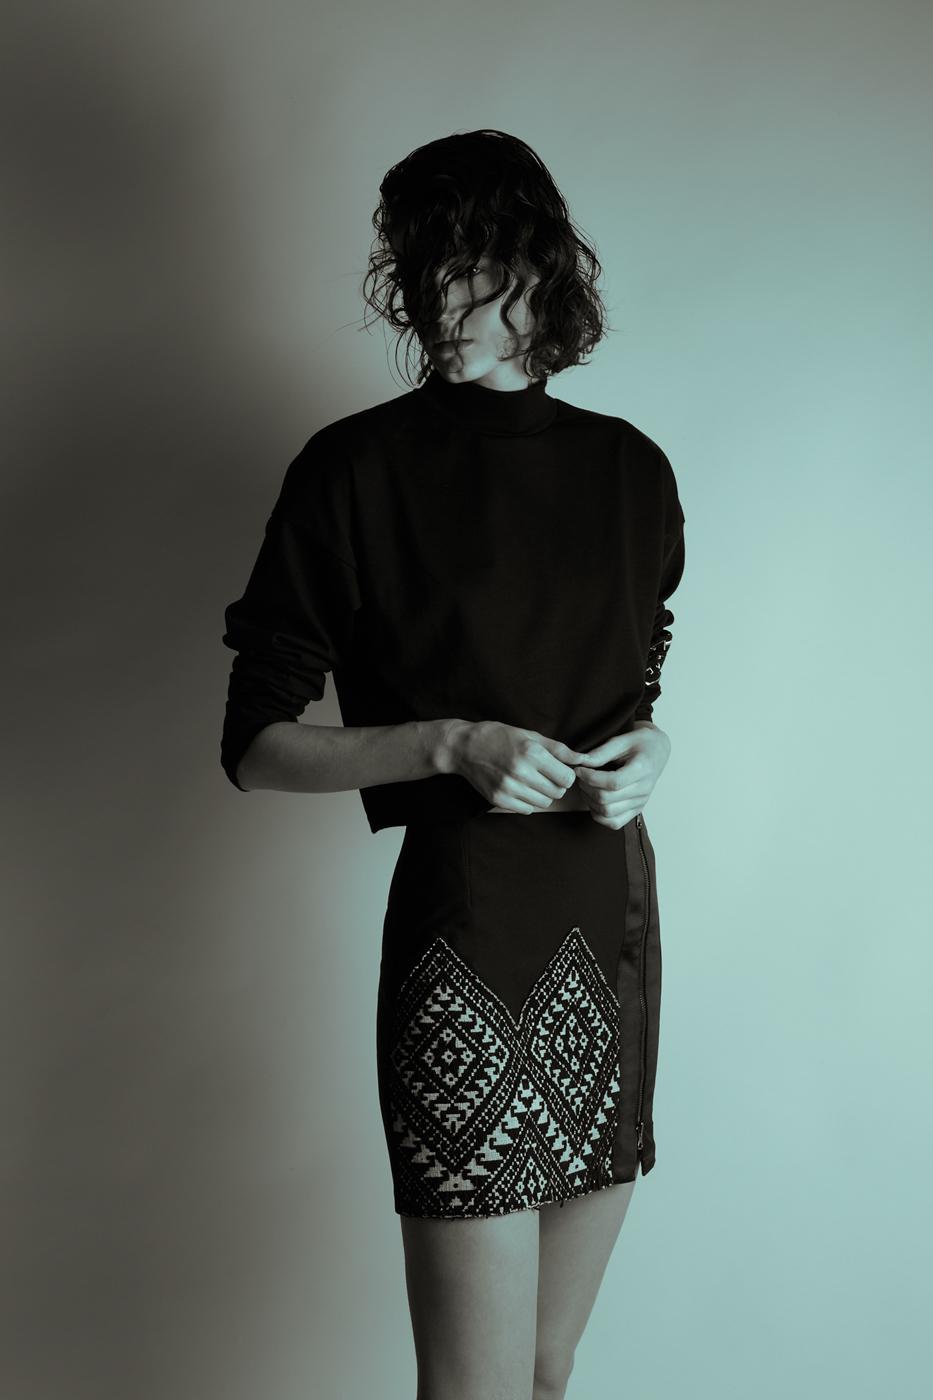 Top: Topshop; Skirt: Atelier Pichita